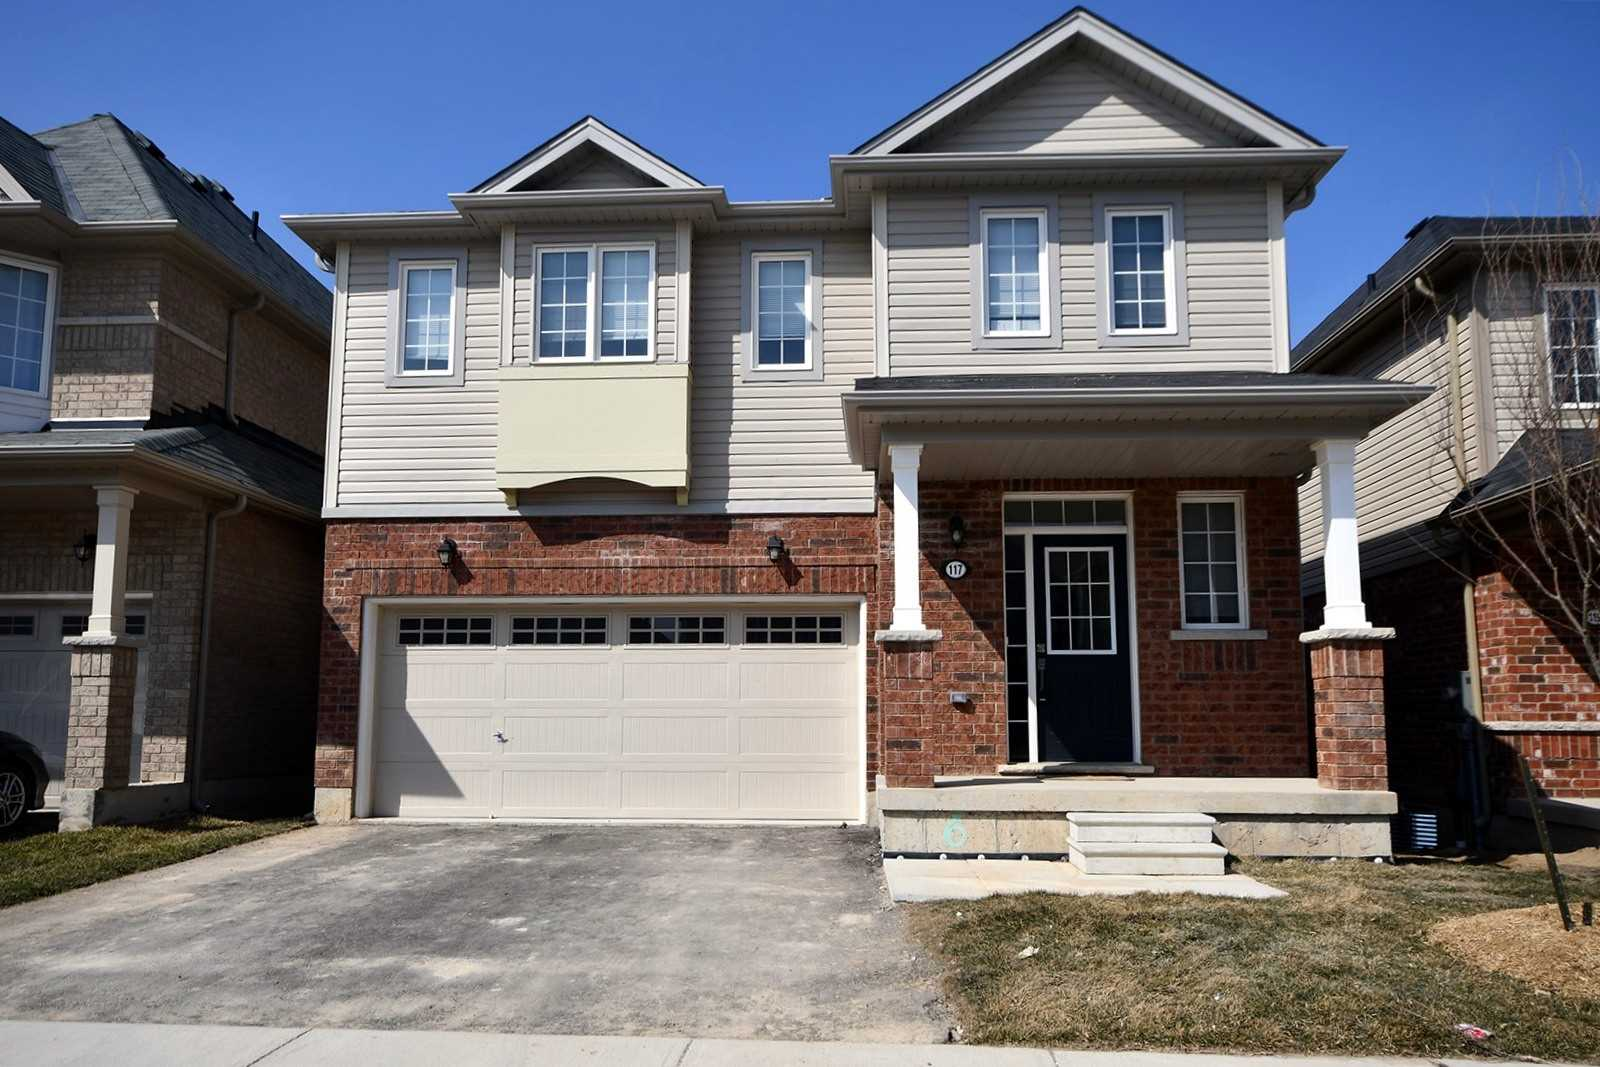 117 Munro Circ, Brantford, Ontario N3T0R3, 4 Bedrooms Bedrooms, ,3 BathroomsBathrooms,Detached,For Sale,Munro,X5159175